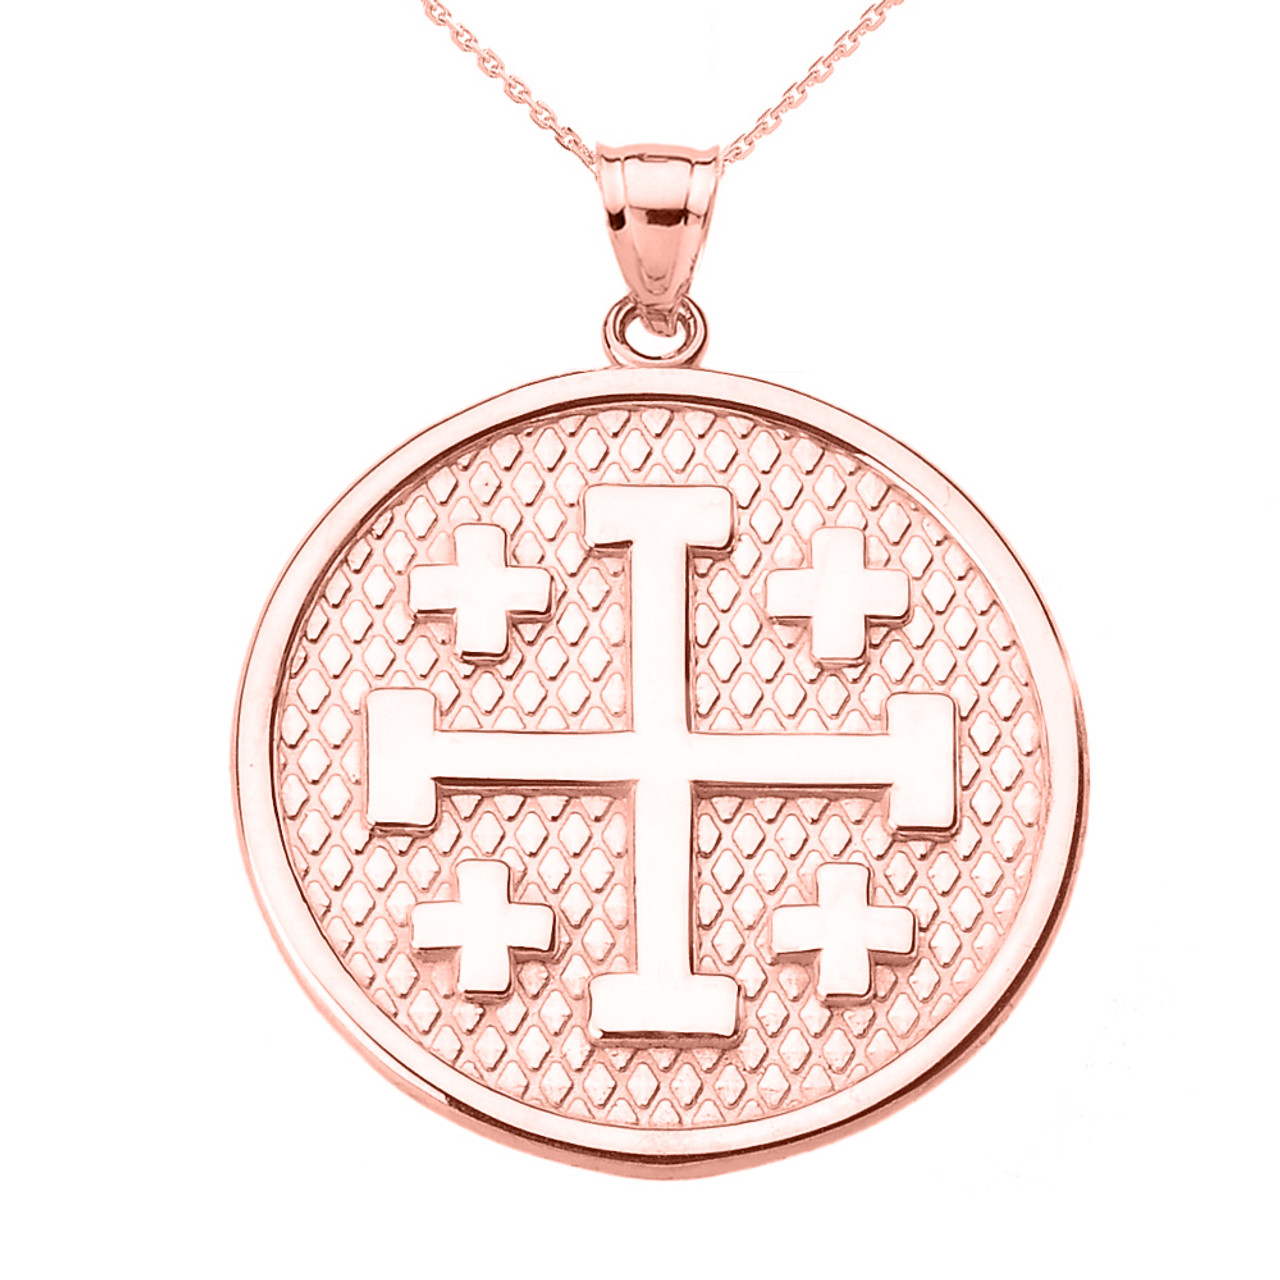 Freemason Masonic Jewelry Polished 14k Rose Gold Crusaders Jerusalem Cross Pendant Necklace